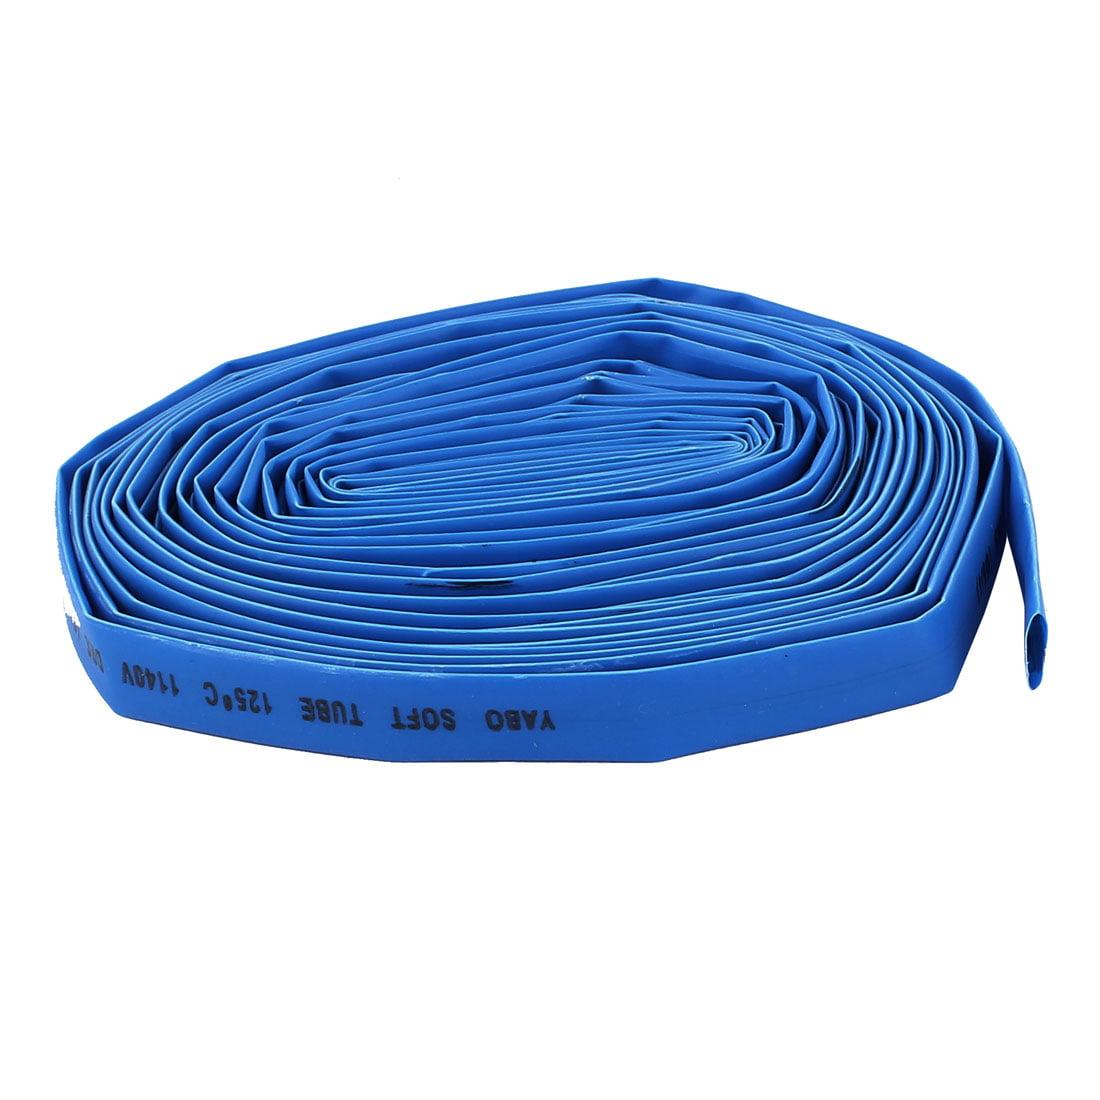 8mm Dia 8M Long Polyolefin Insulating Heat Shrinkable Tube Blue Ratio 2:1